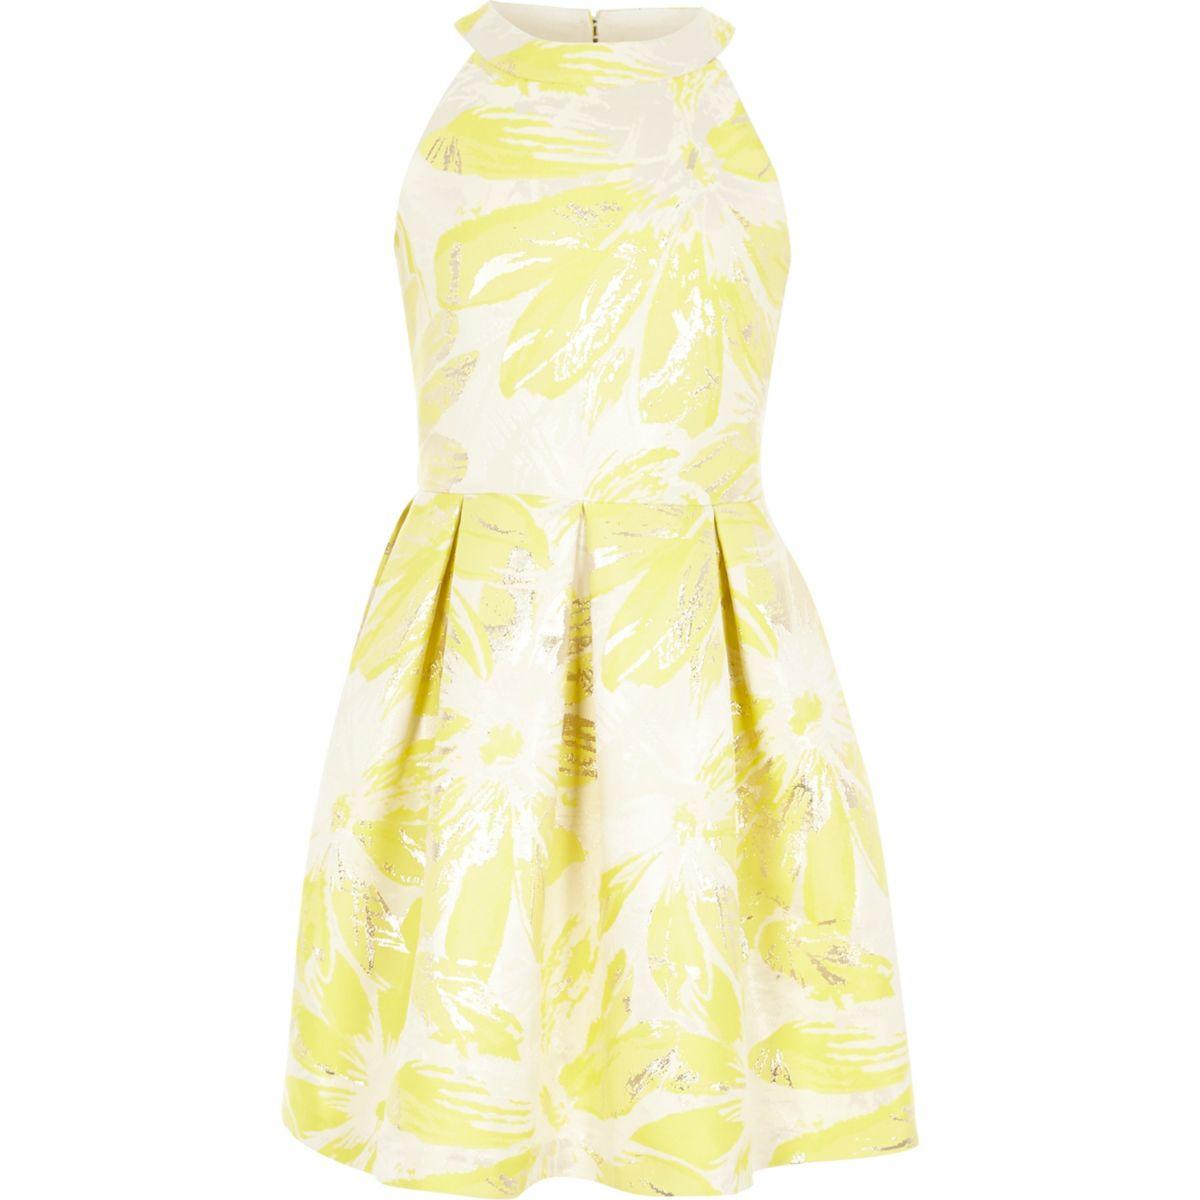 Girls yellow floral jacquard prom dress